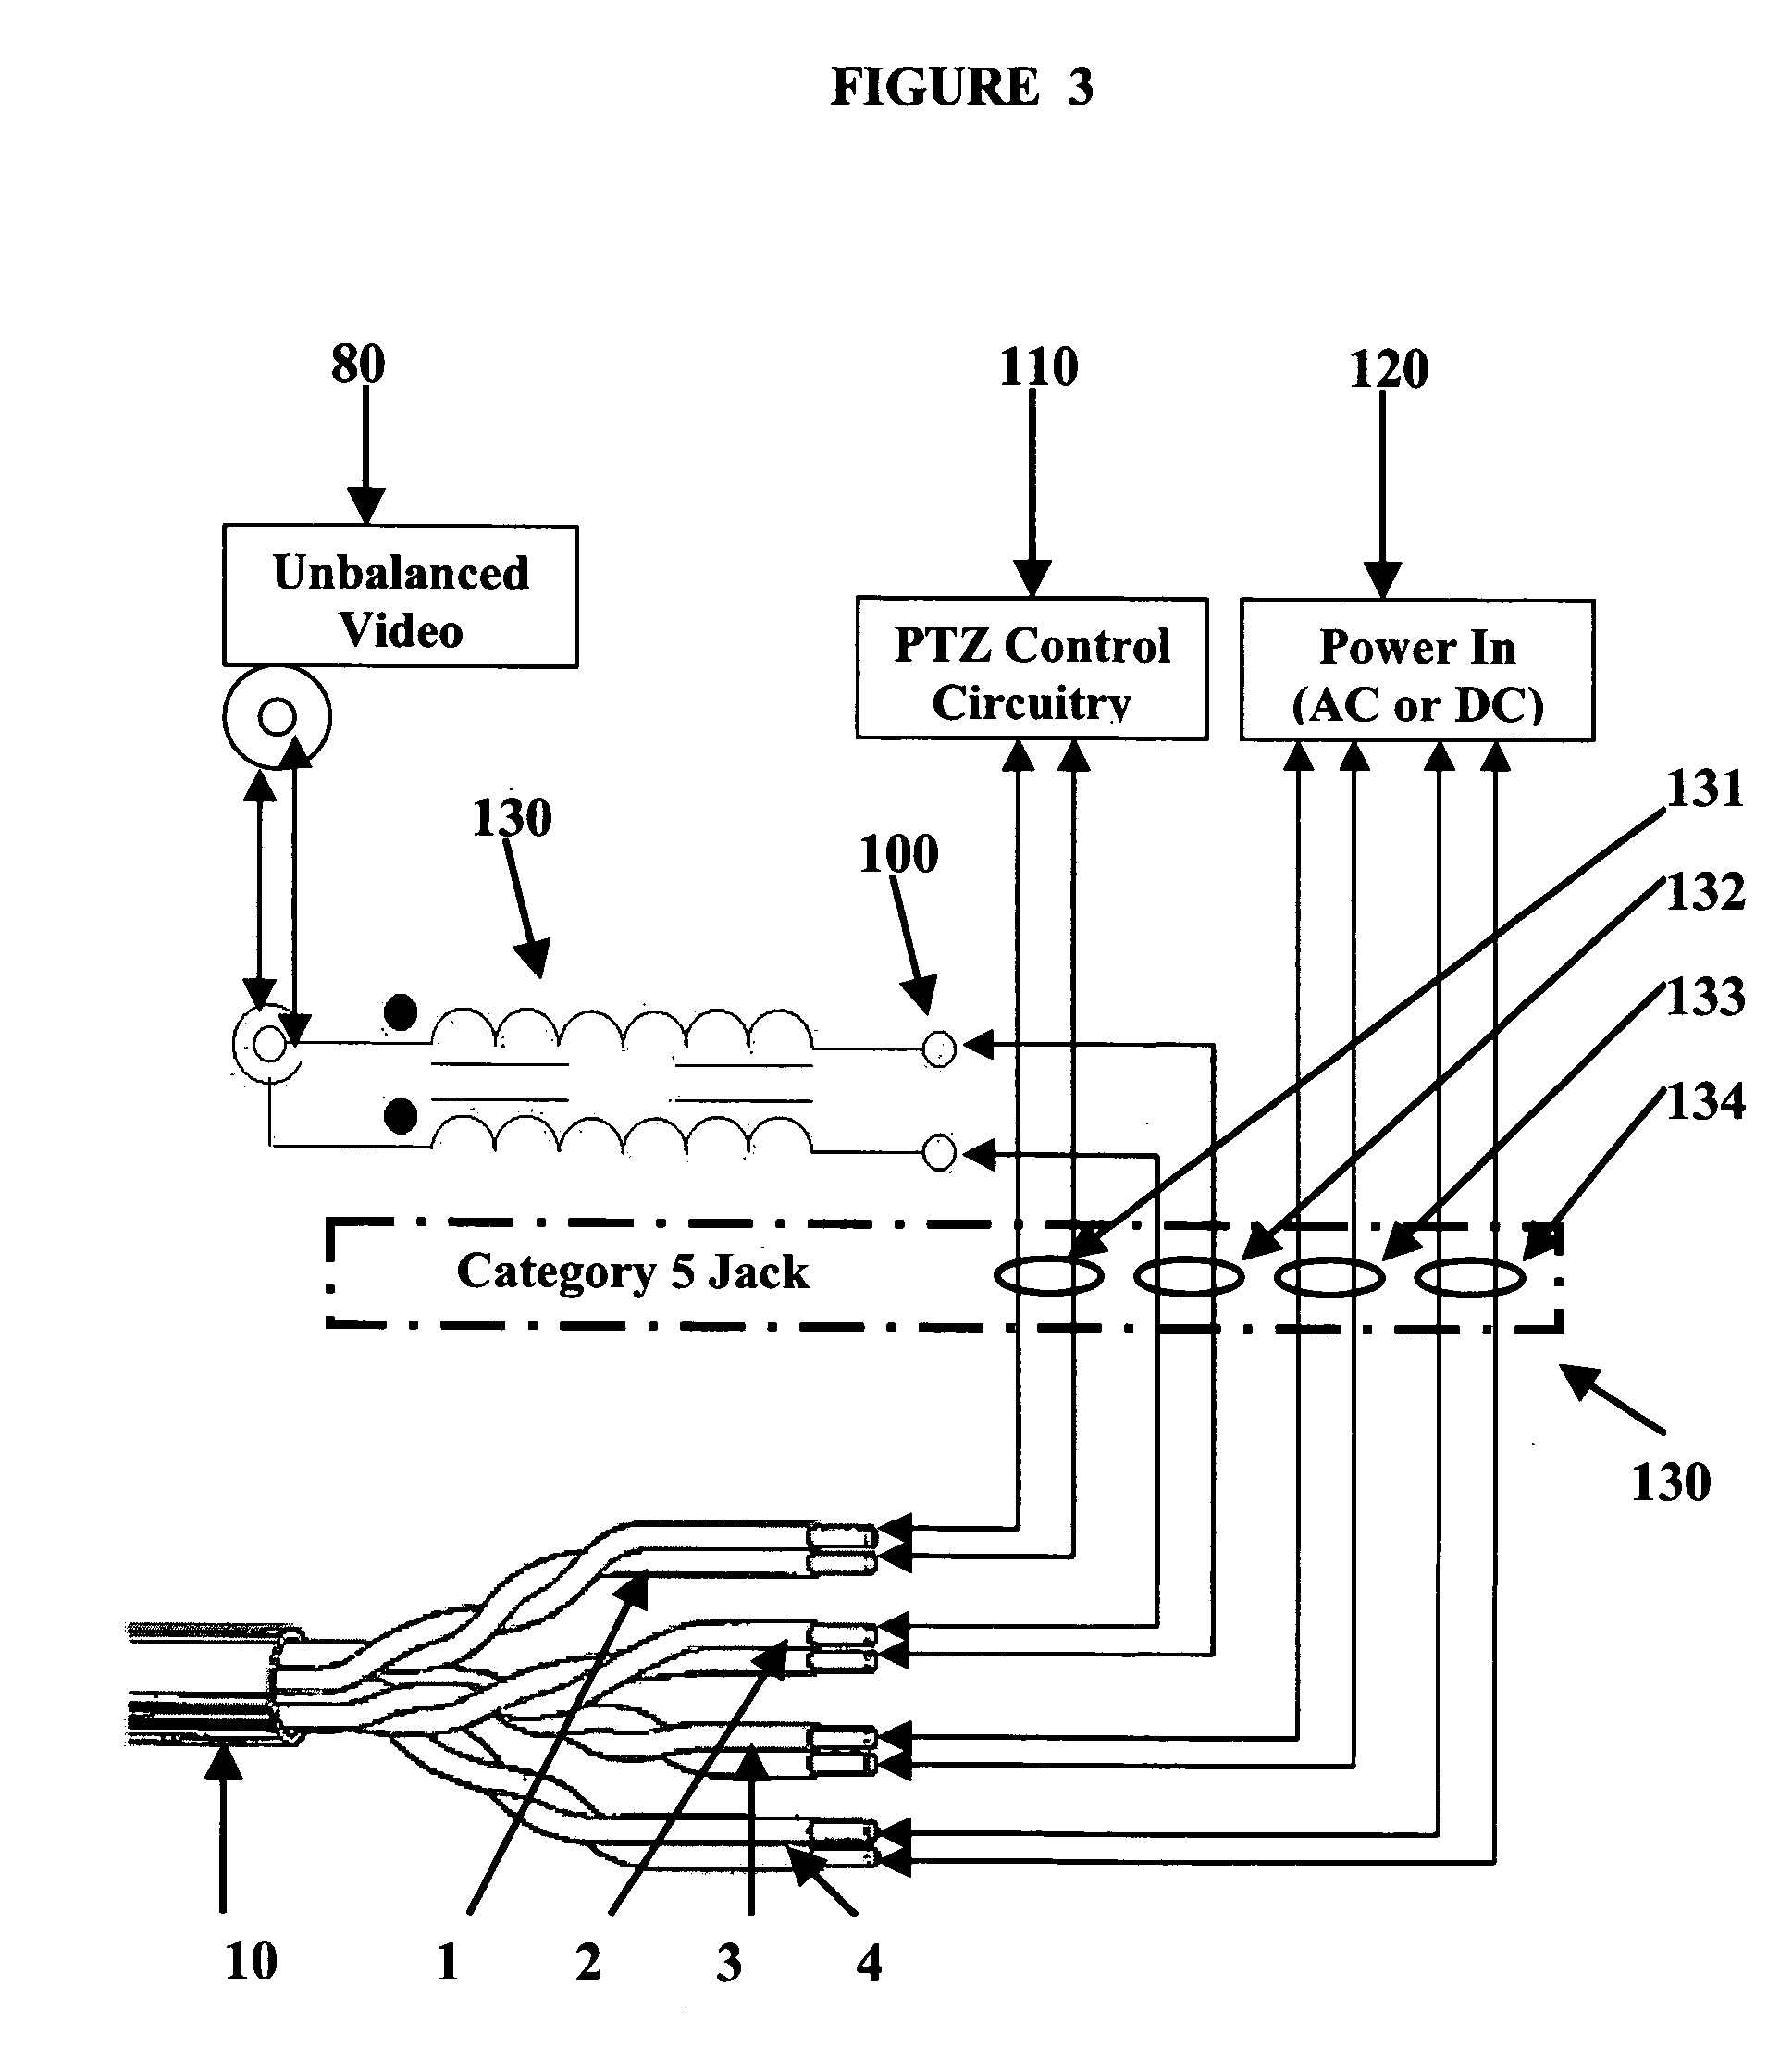 Power jack wiring diagram mazda 6 rf wiring diagram at ww w freeautoresponder